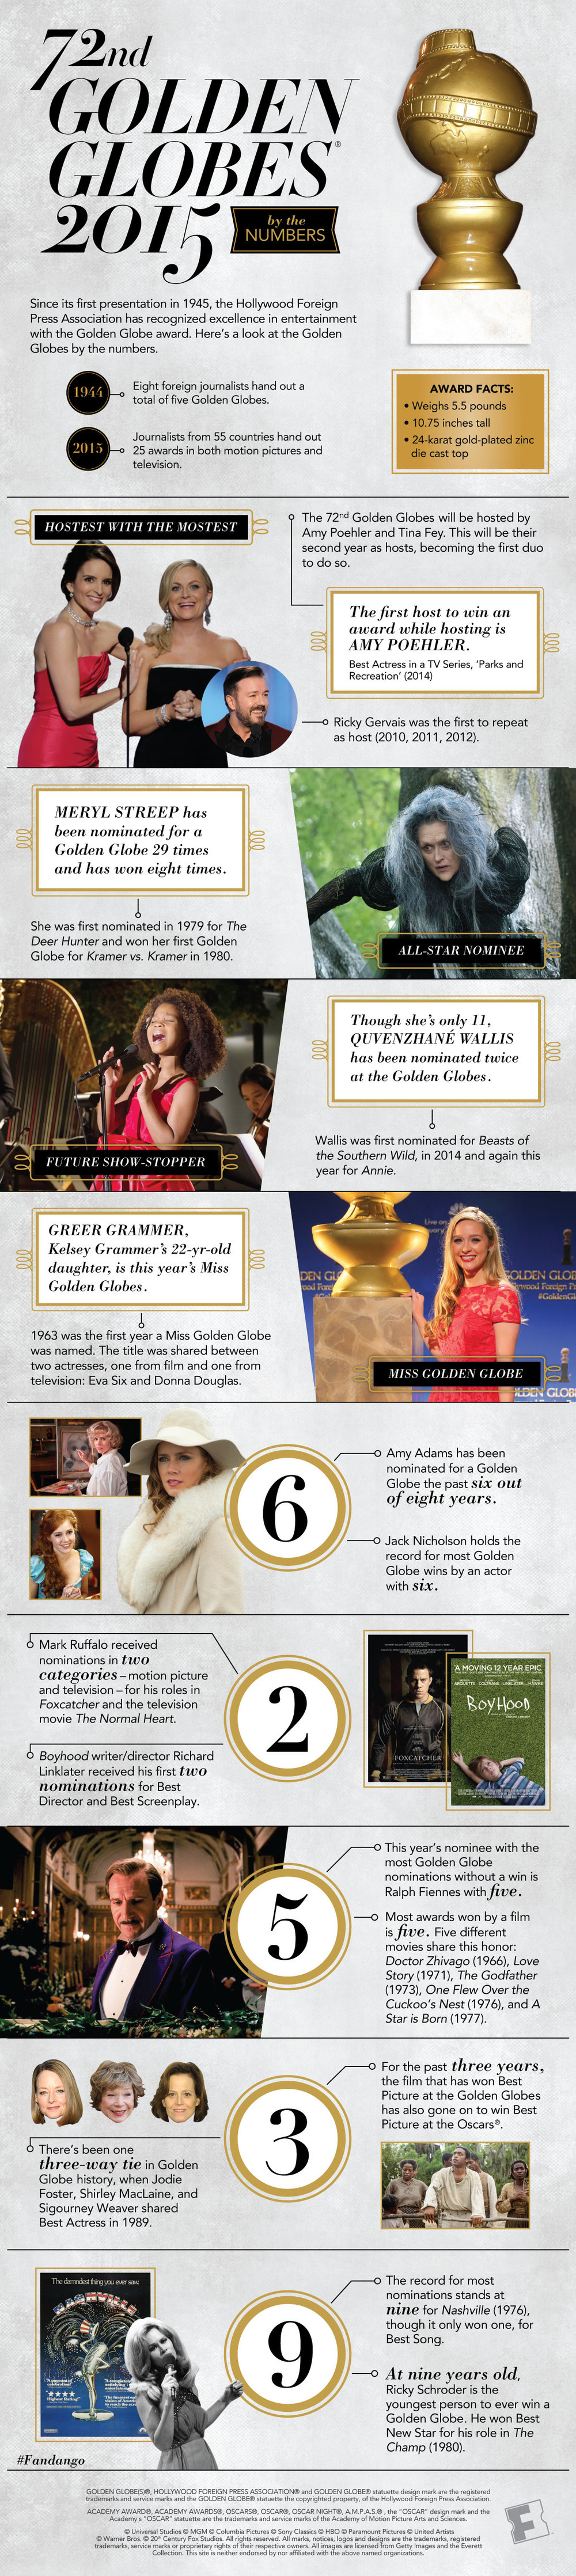 GoldenGlobes_infographic_v7.jpg